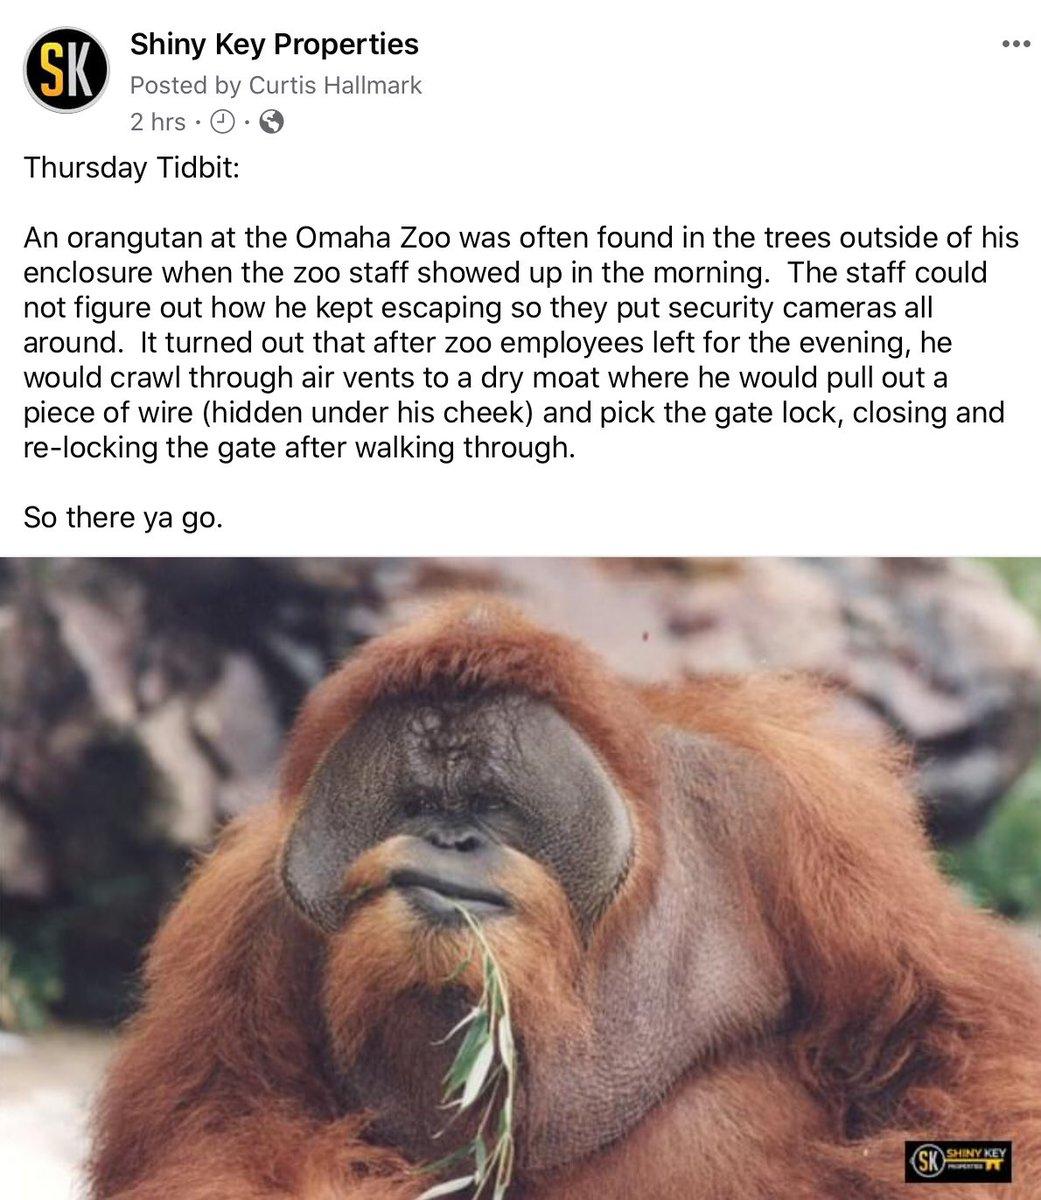 #shinykeyproperties #thursdaytidbit #orangutan #escapeartist #interestingfacts #didyouknow #omahazoo #houdini #business #realestate #sellmypropertyfastdfw #funny #lockpicking #reasontosmilepic.twitter.com/u1ANCz7IDk